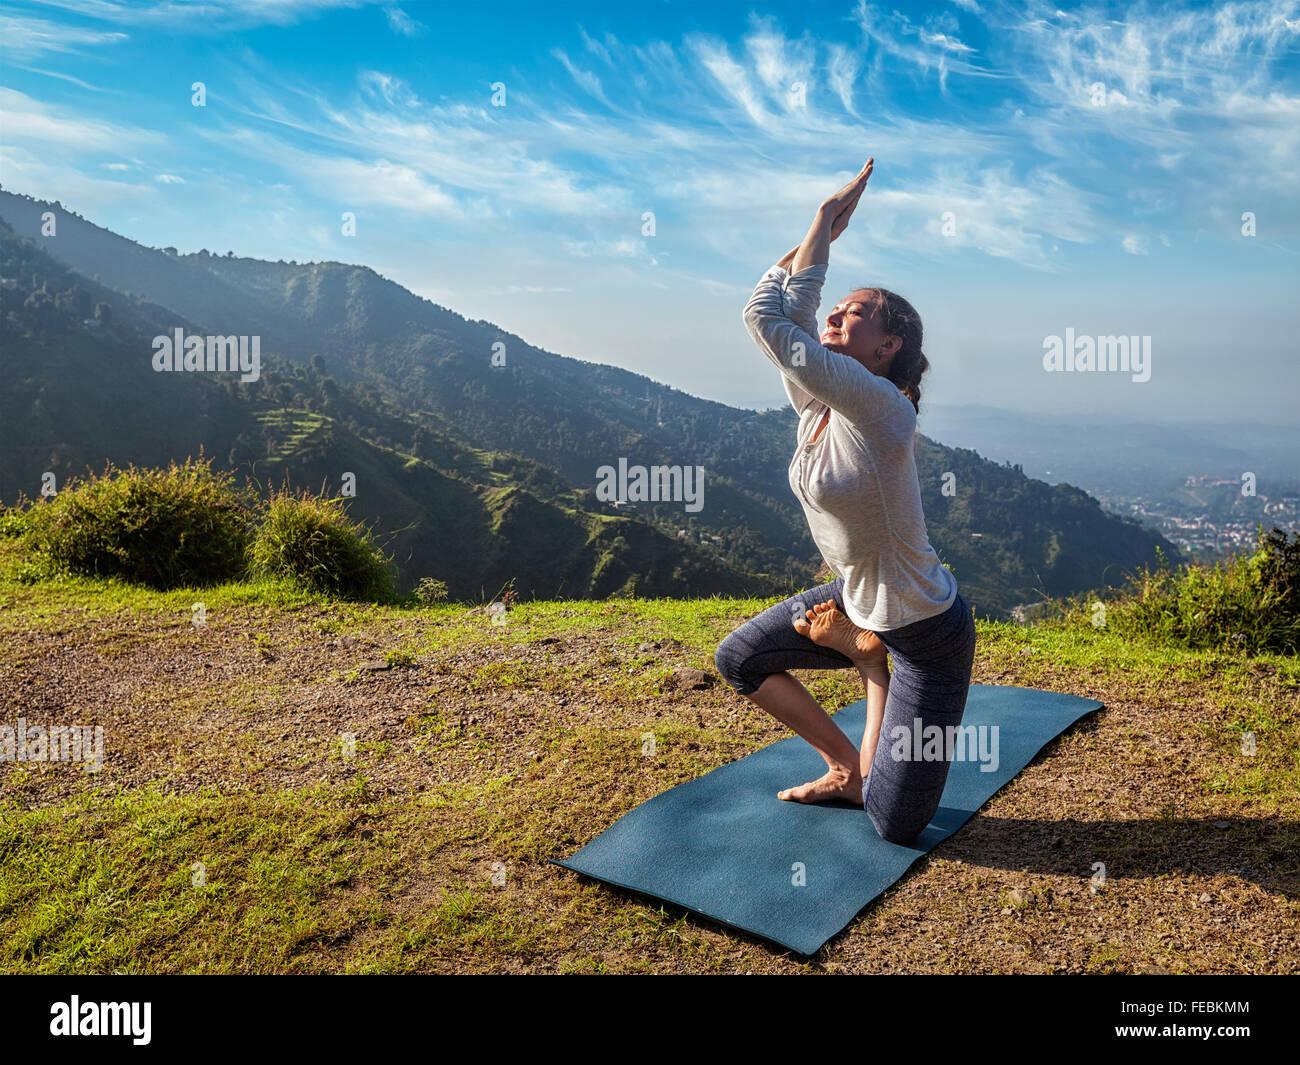 Donna facendo Ashtanga Vinyasa yoga asana avanzate Immagini Stock